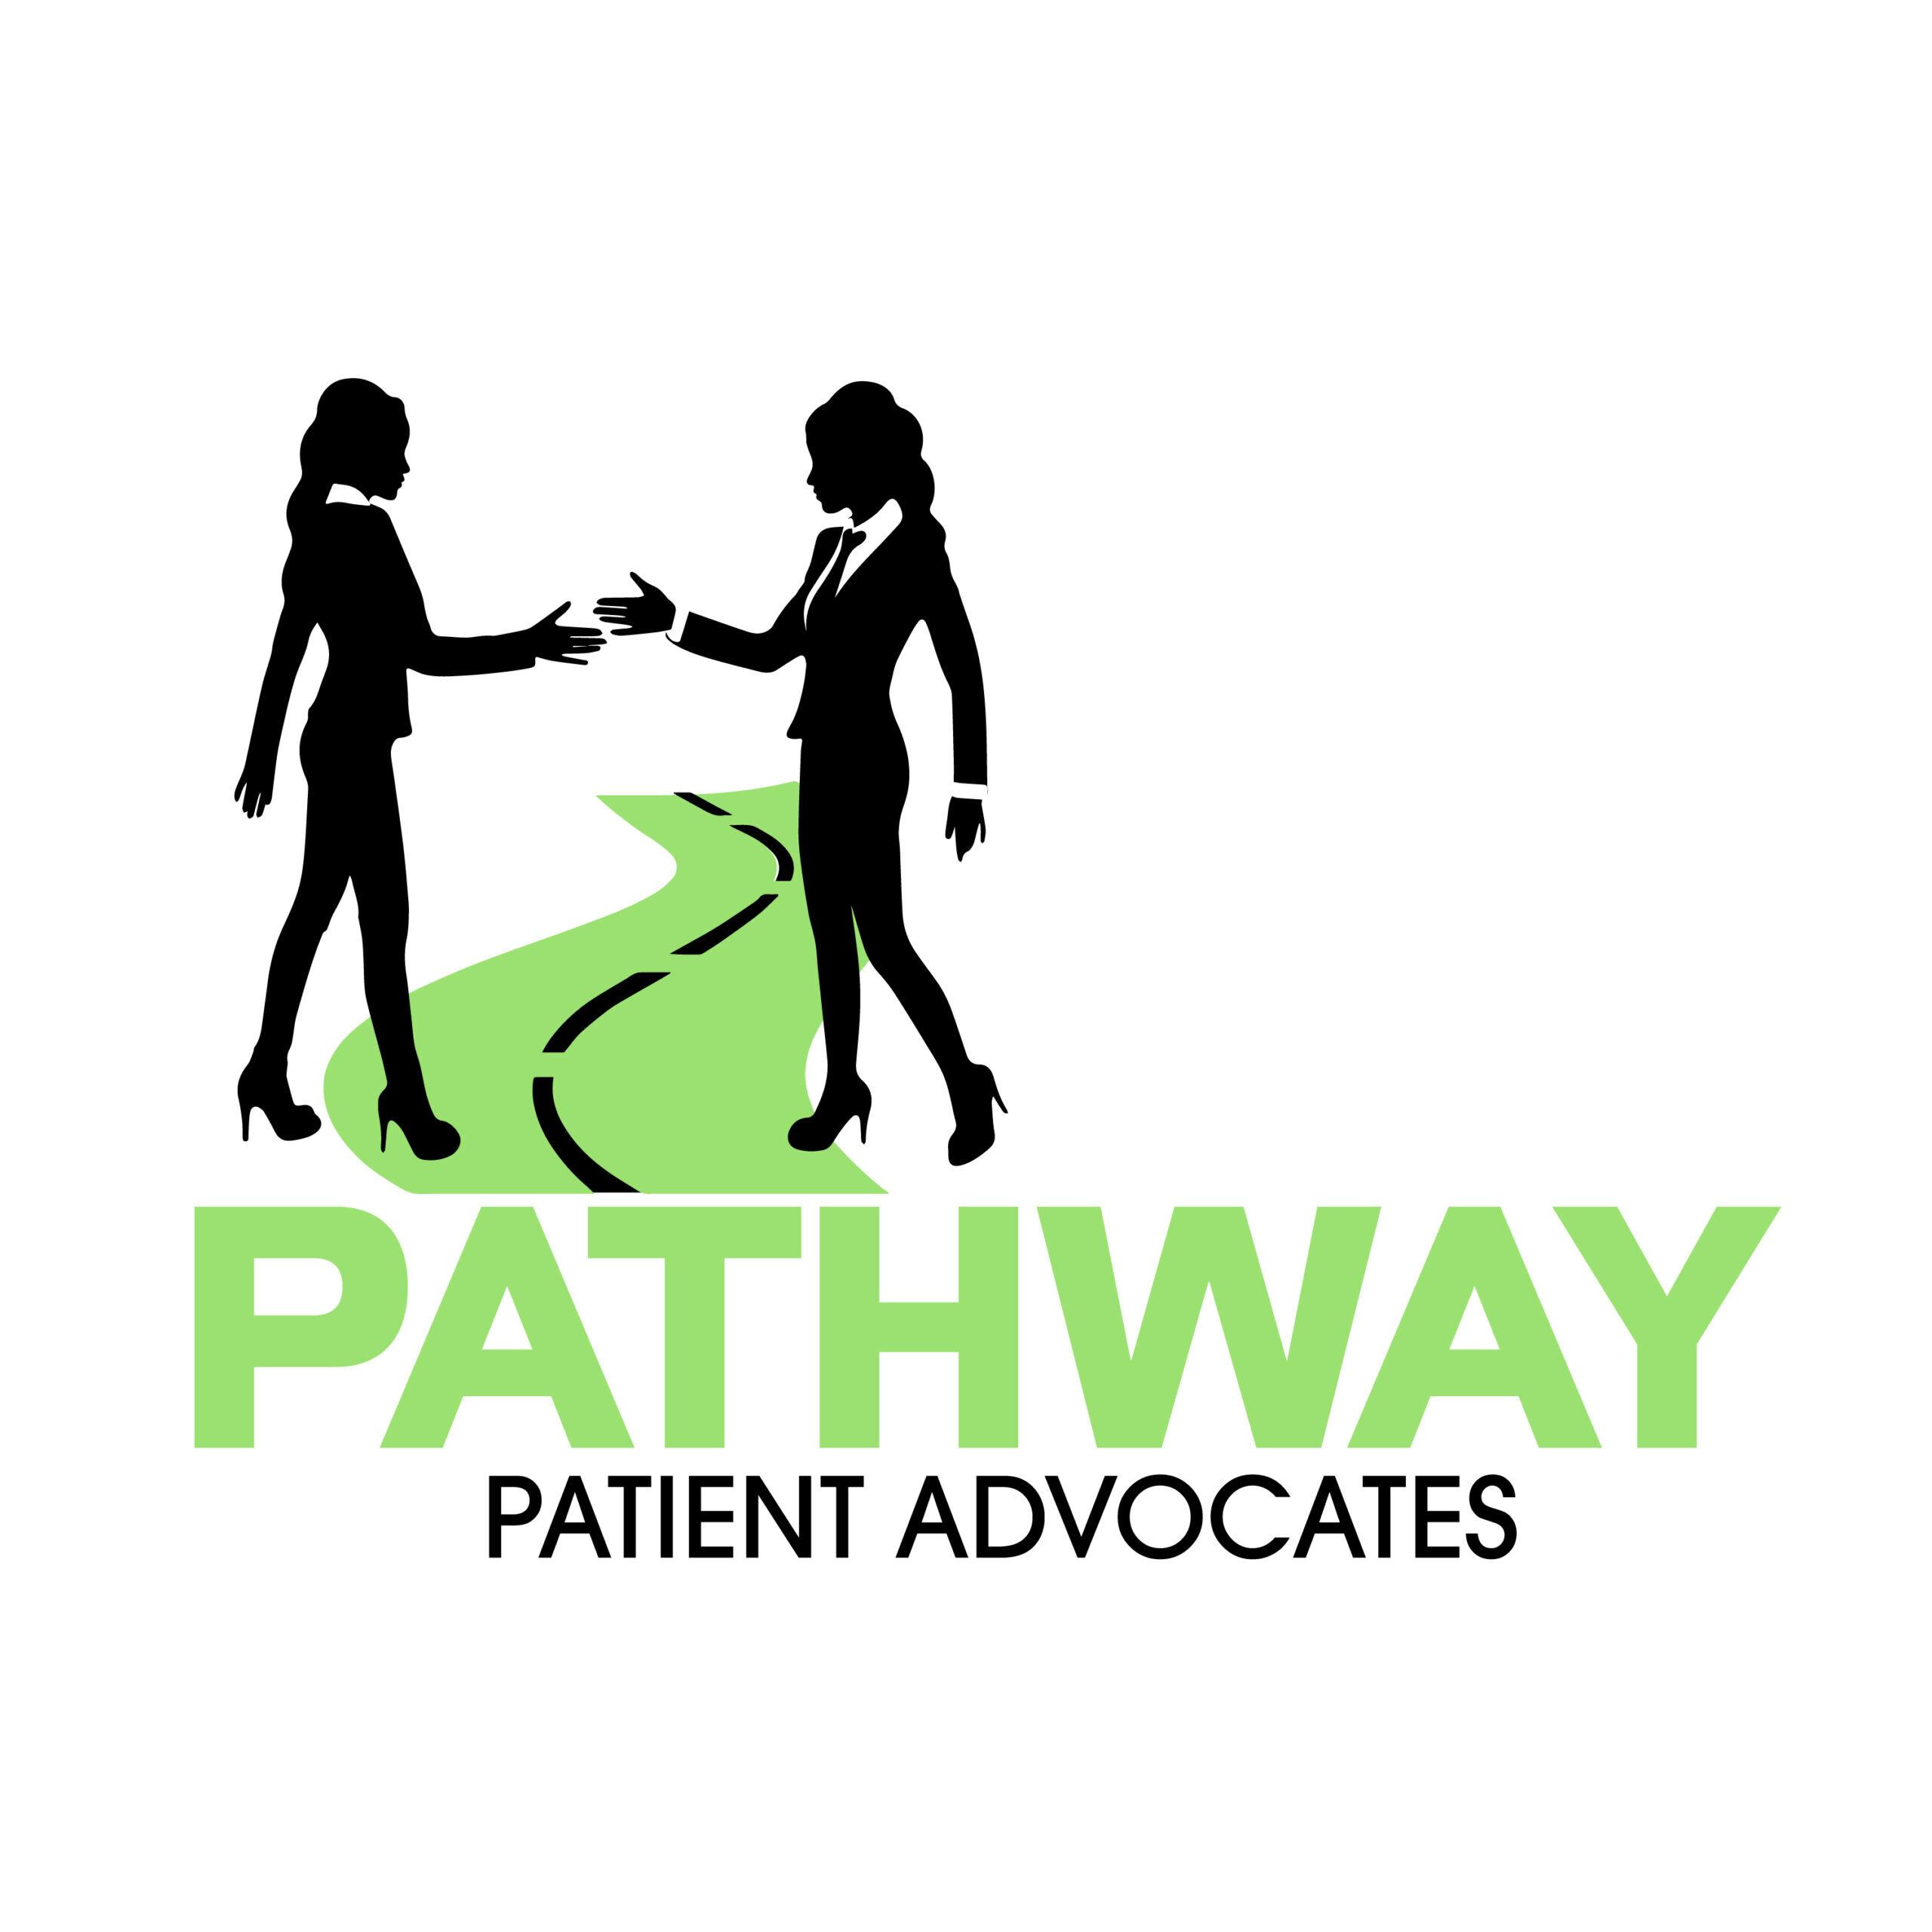 Pathway Patient Advocates